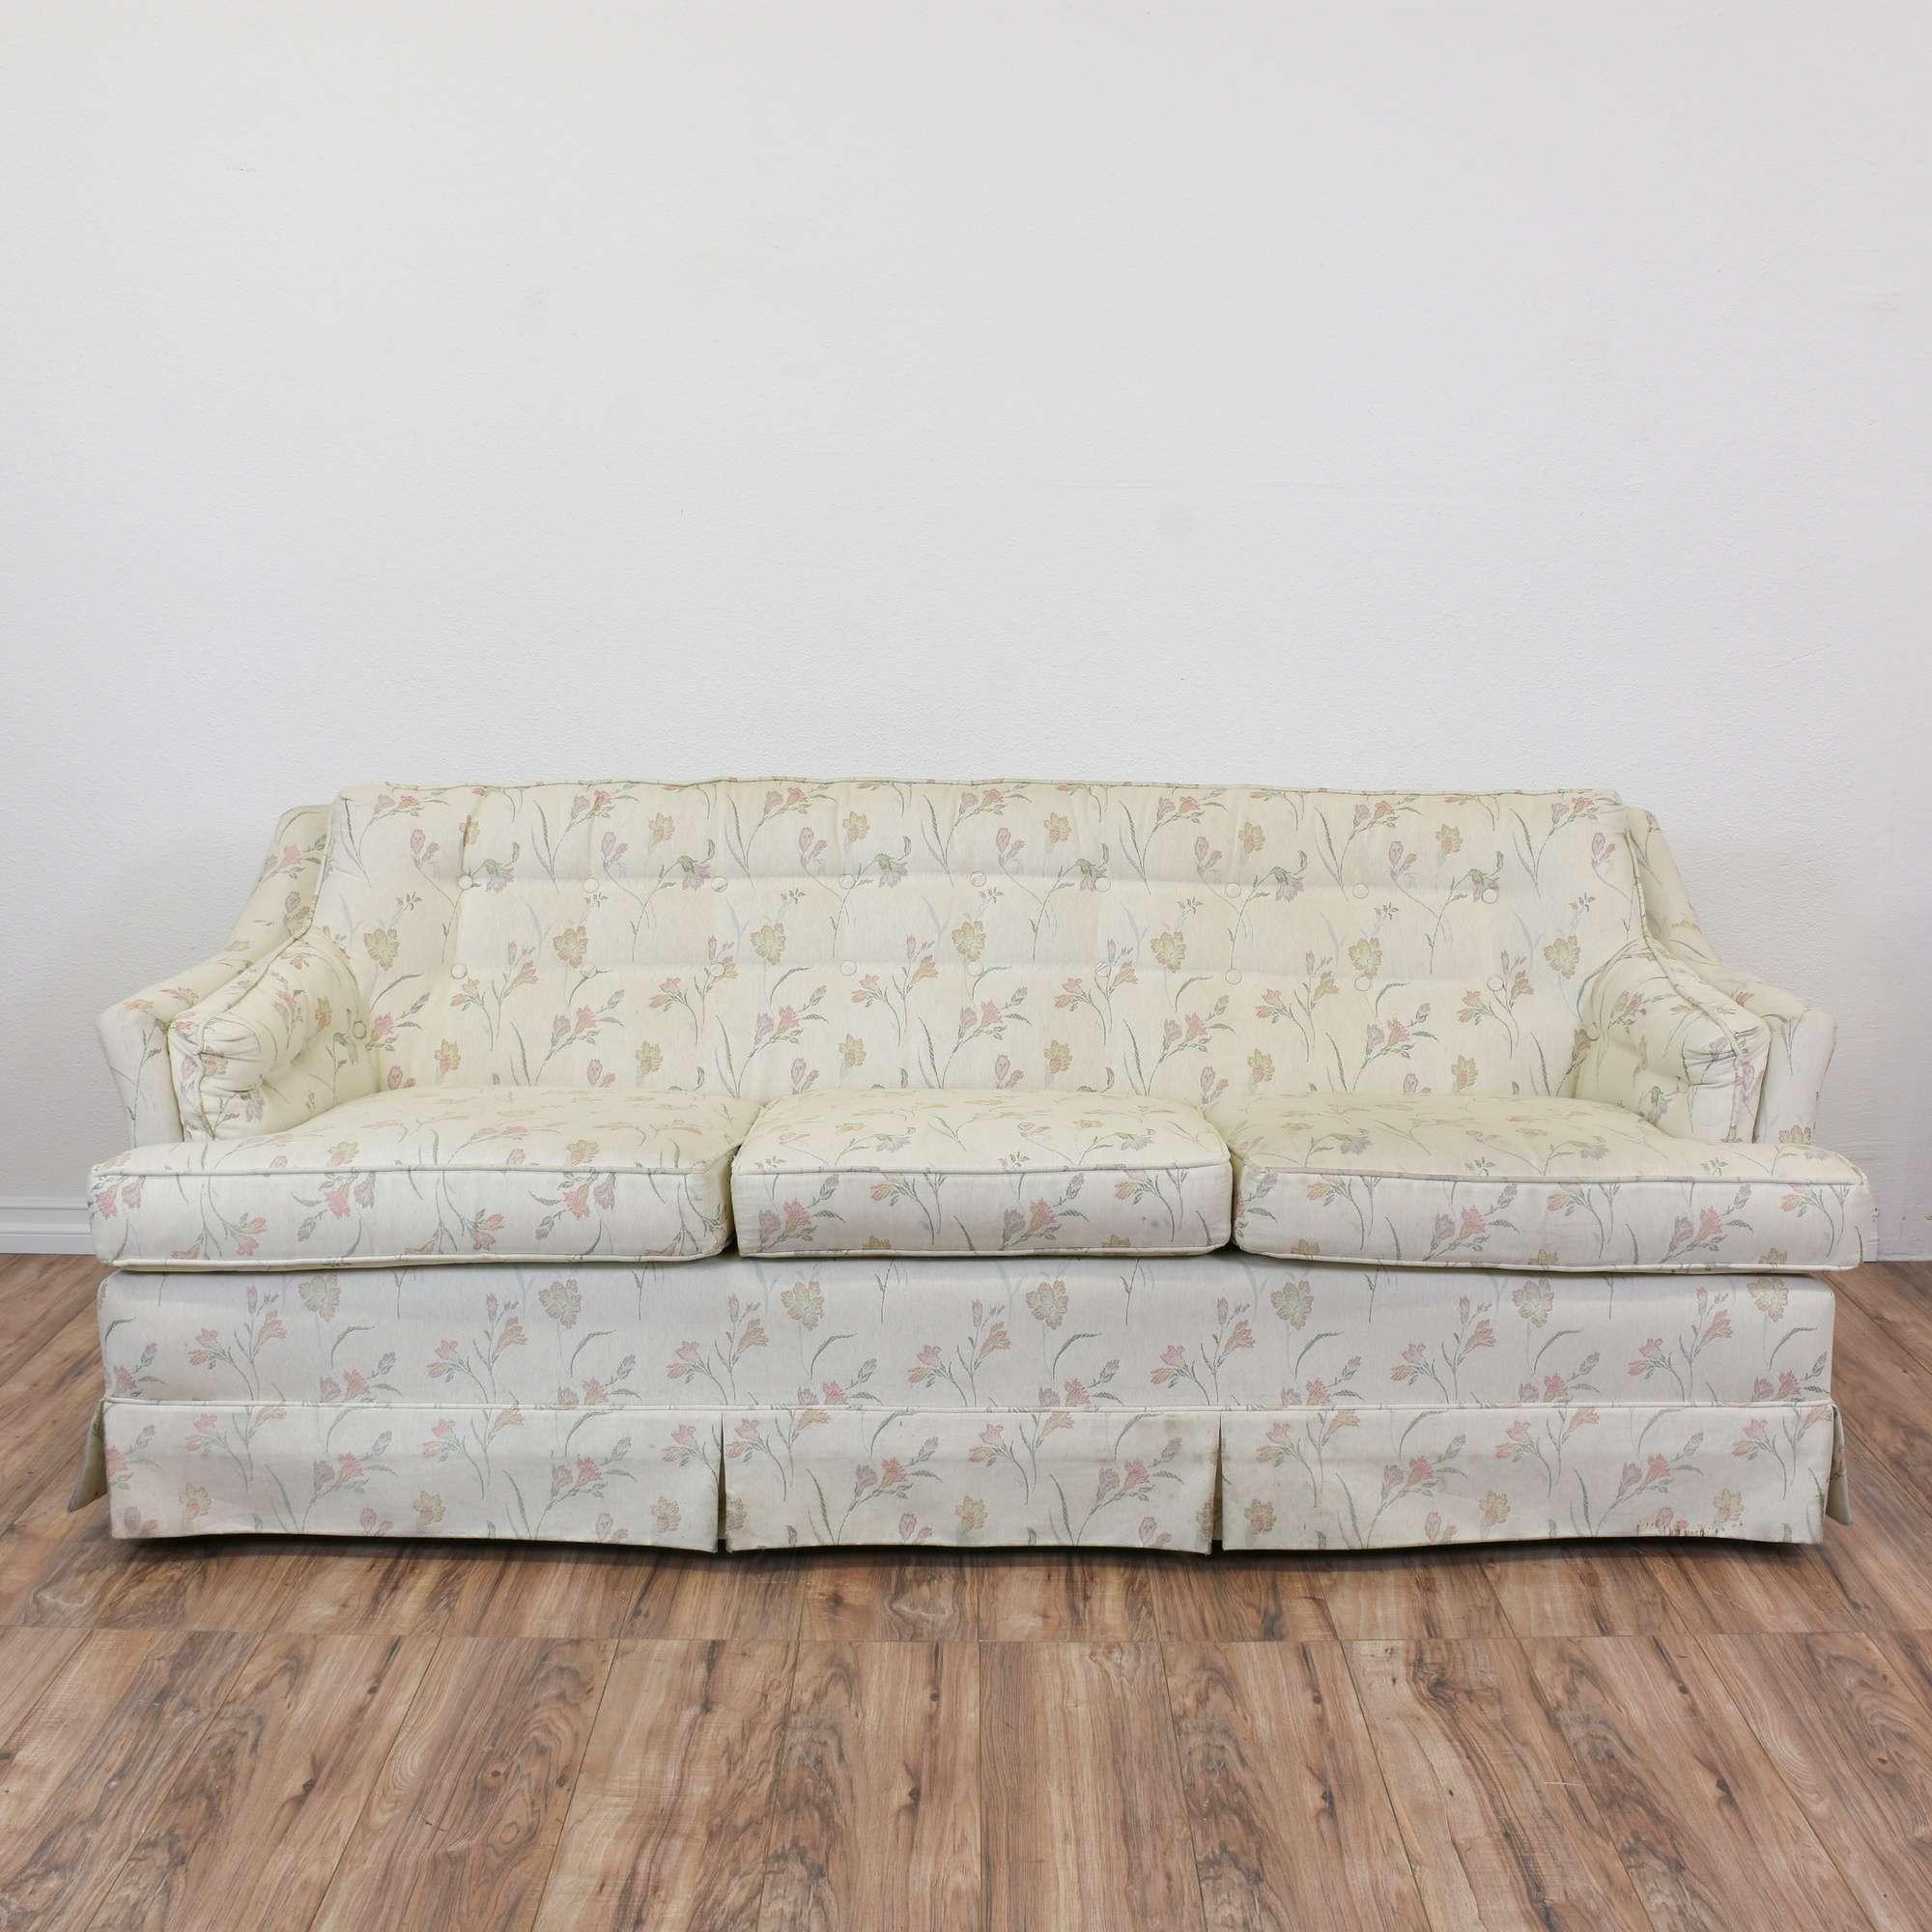 "Cavalier"" White Floral Tufted Sofa"